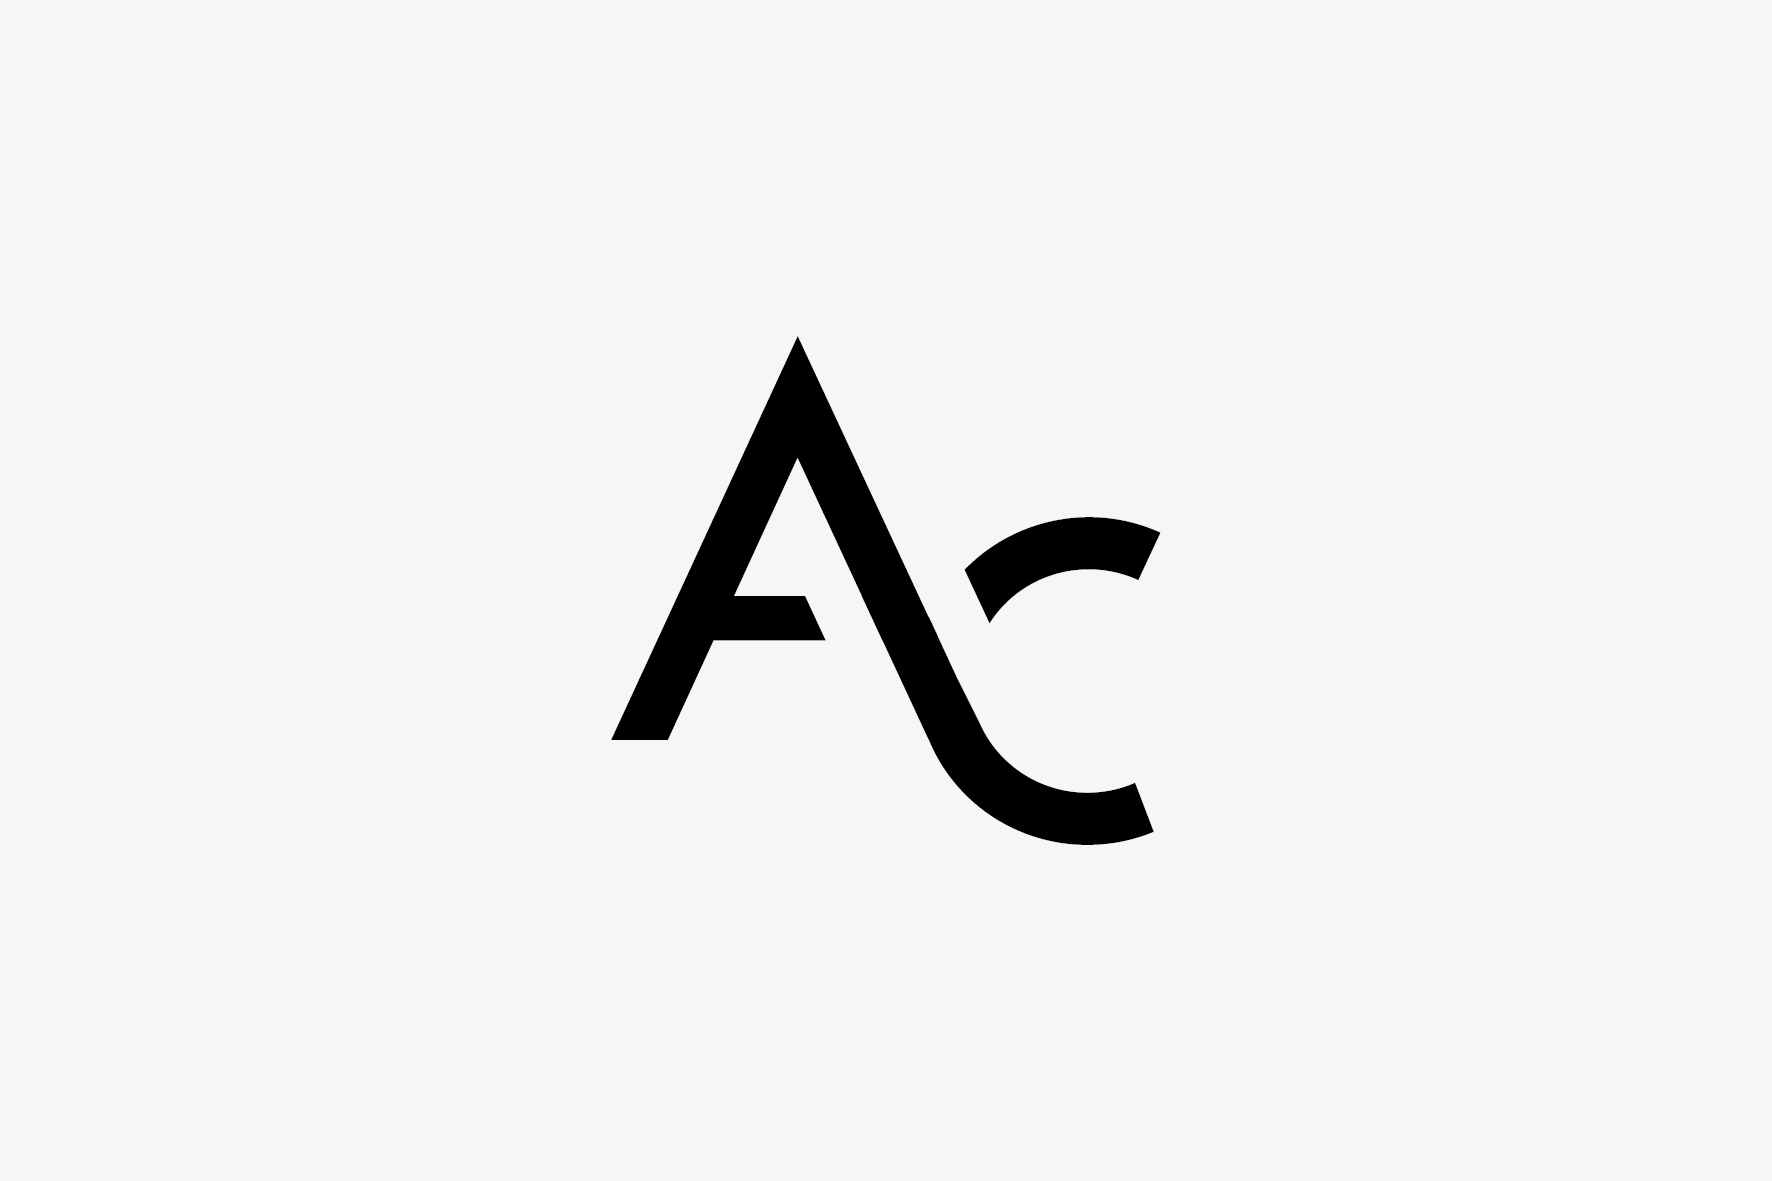 <br /> <b>Warning</b>:  Illegal string offset 'alt' in <b>/web/htdocs/www.monogramsarchive.com/home/wp-content/themes/monogramsarchive/single-monograms.php</b> on line <b>60</b><br /> h